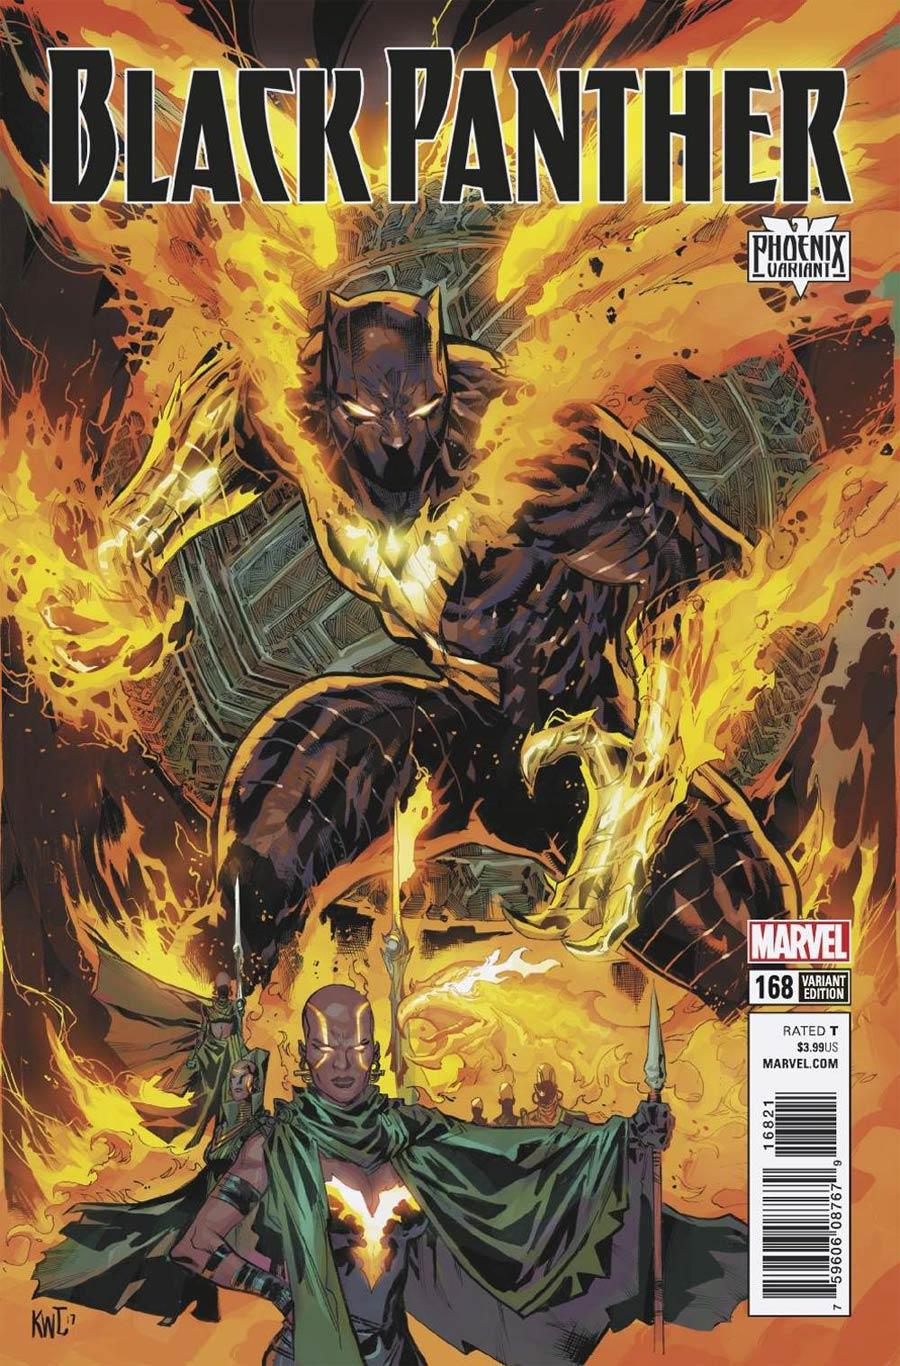 Black Panther #168 Phoenix Variant